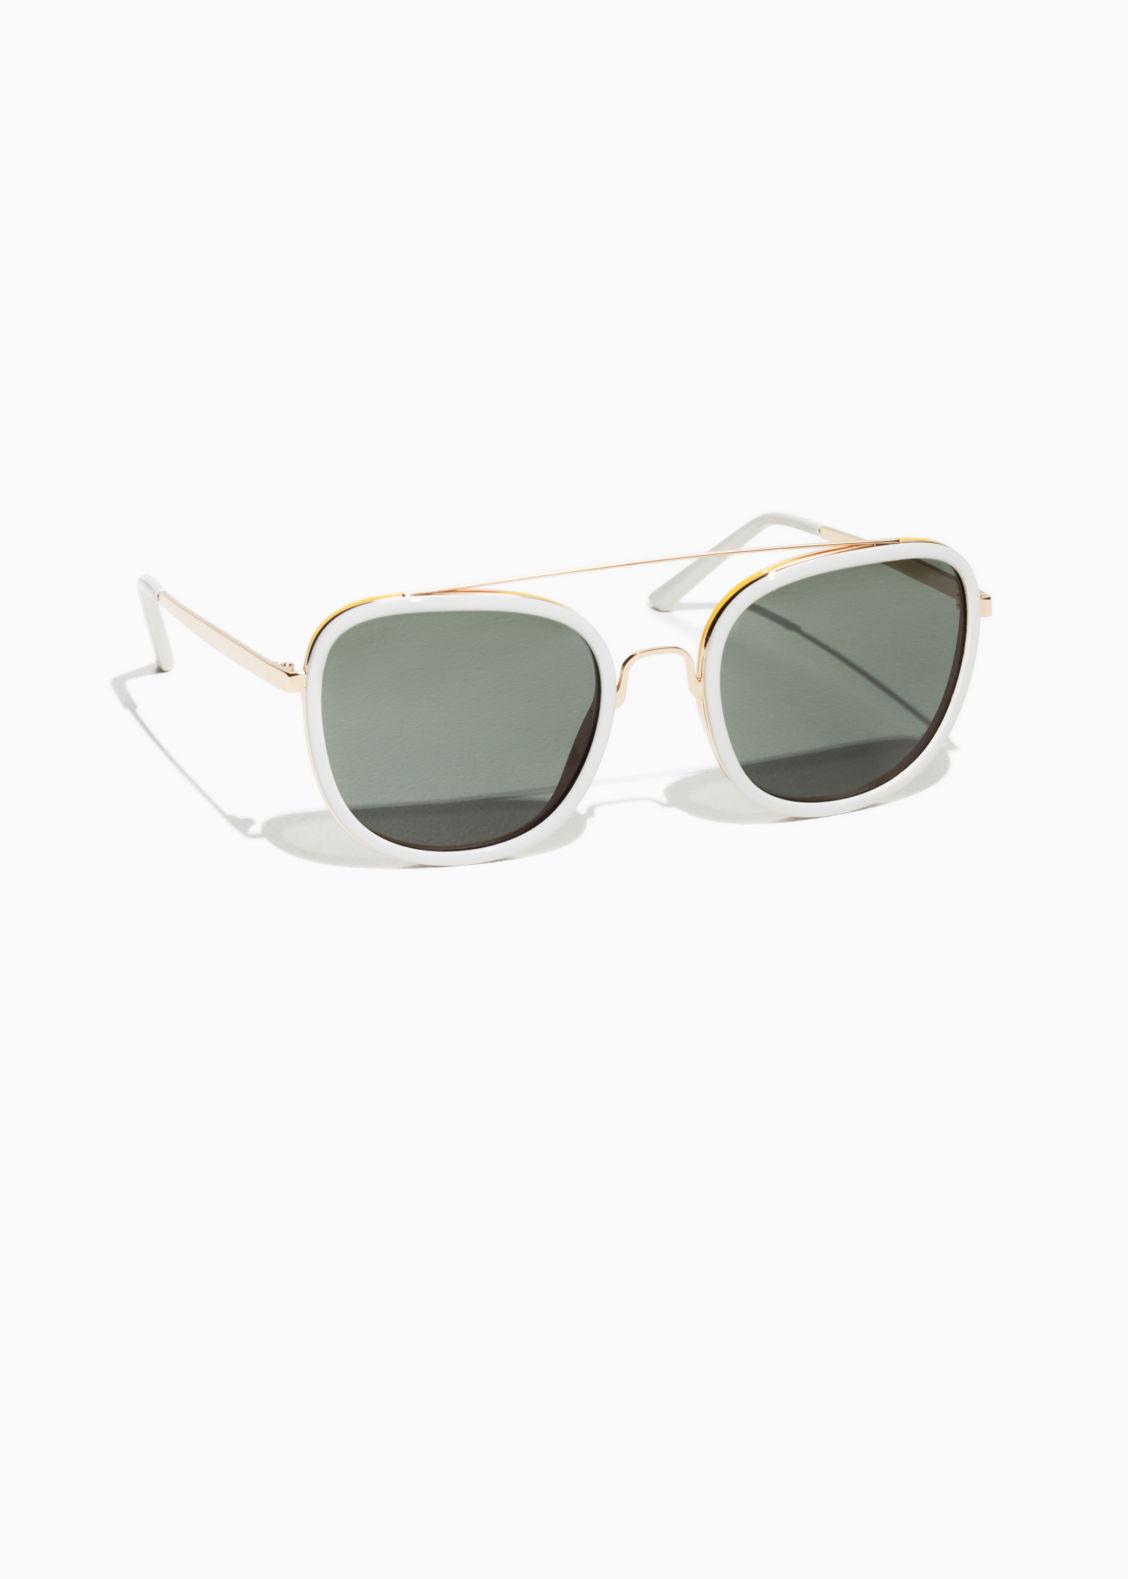 Metal Frame Aviator Sunglasses - White/Gold - Sunglasses - & Other ...